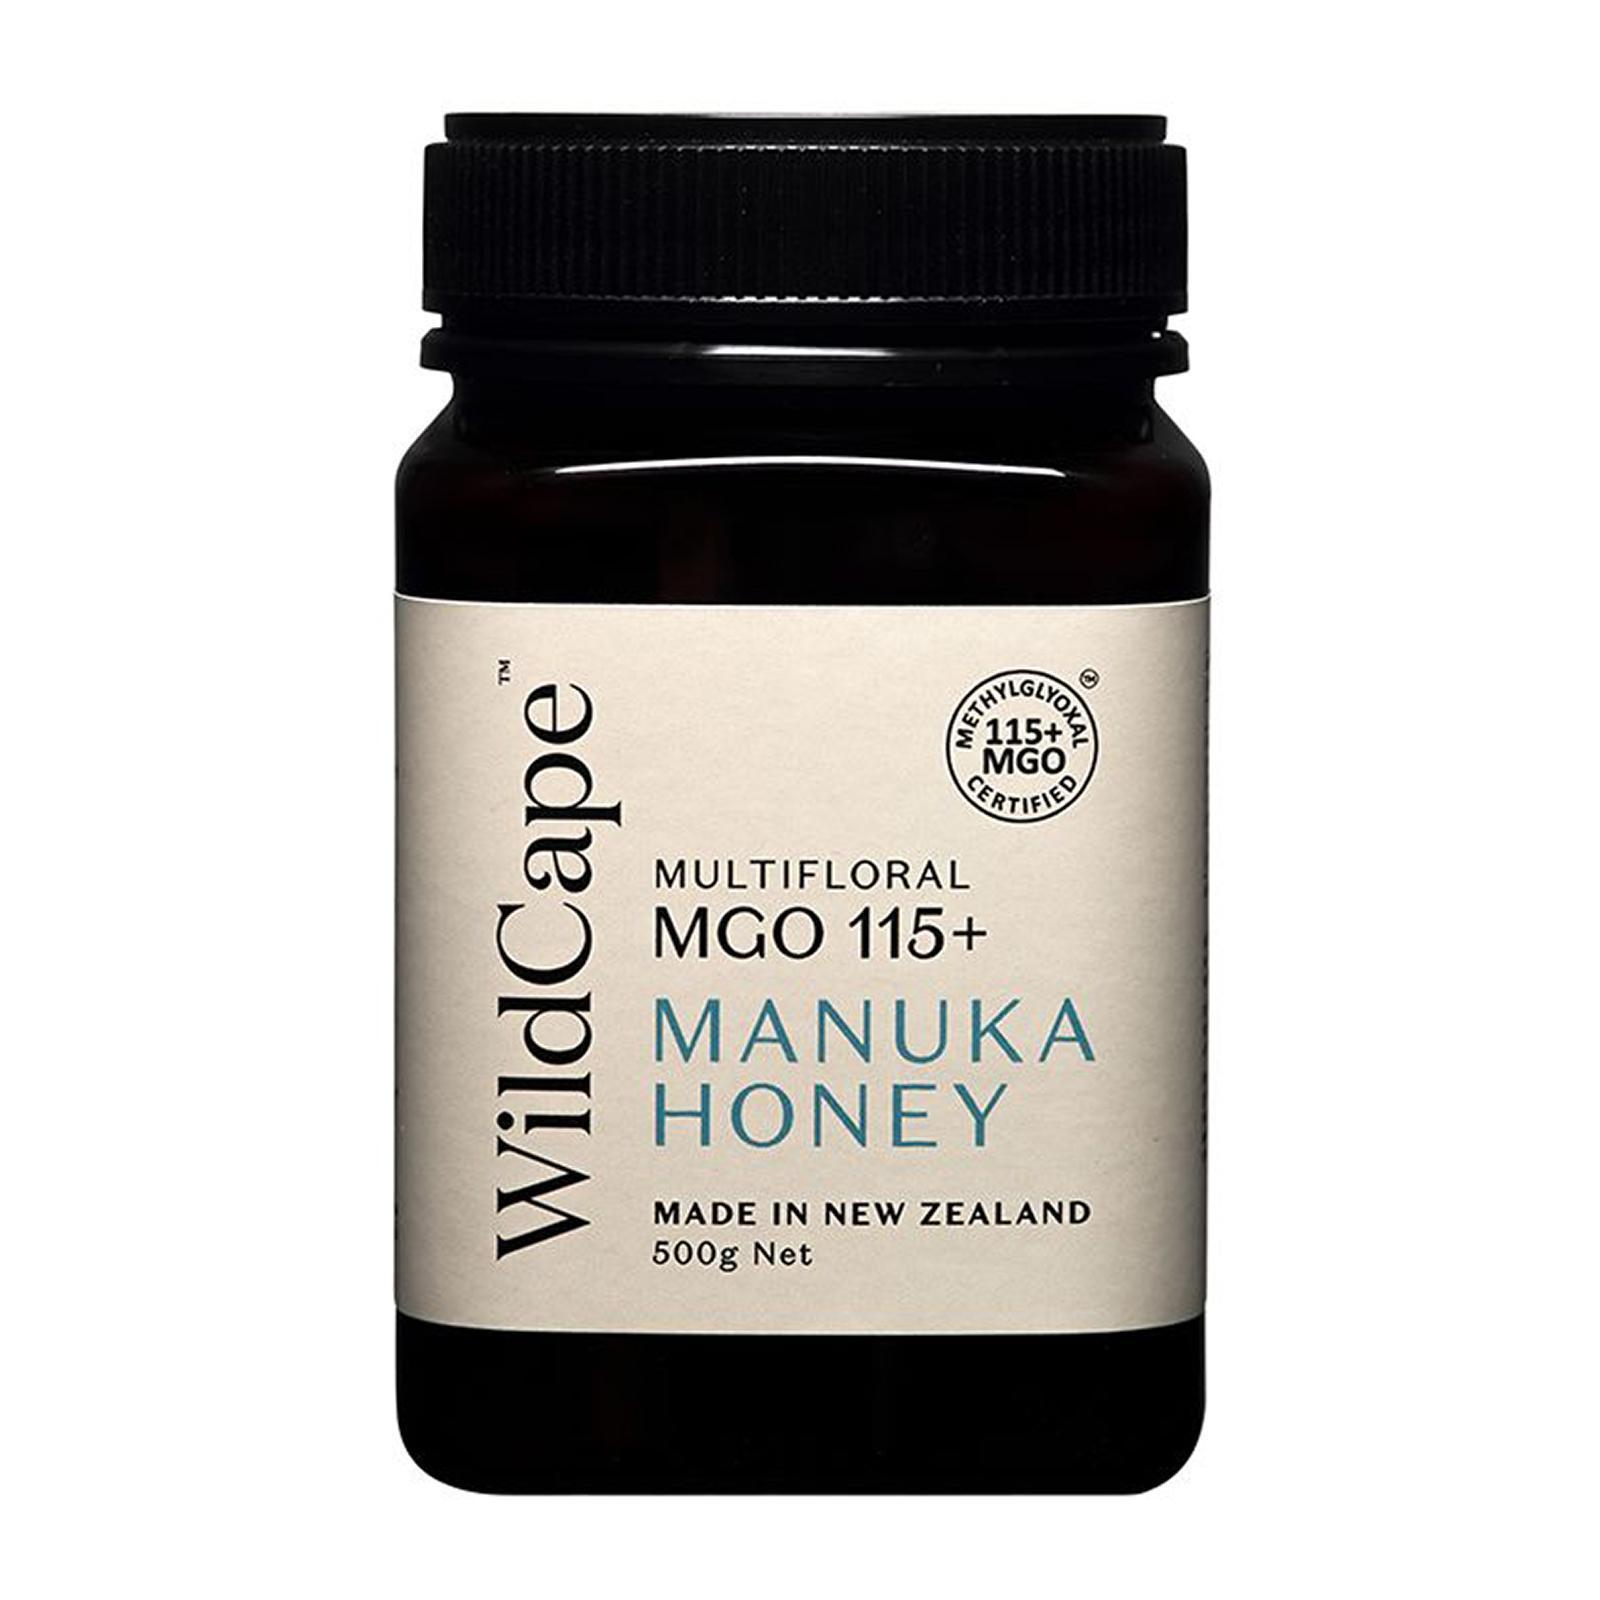 WildCape Mgo 115+ Manuka Honey - By Nature's Nutrition